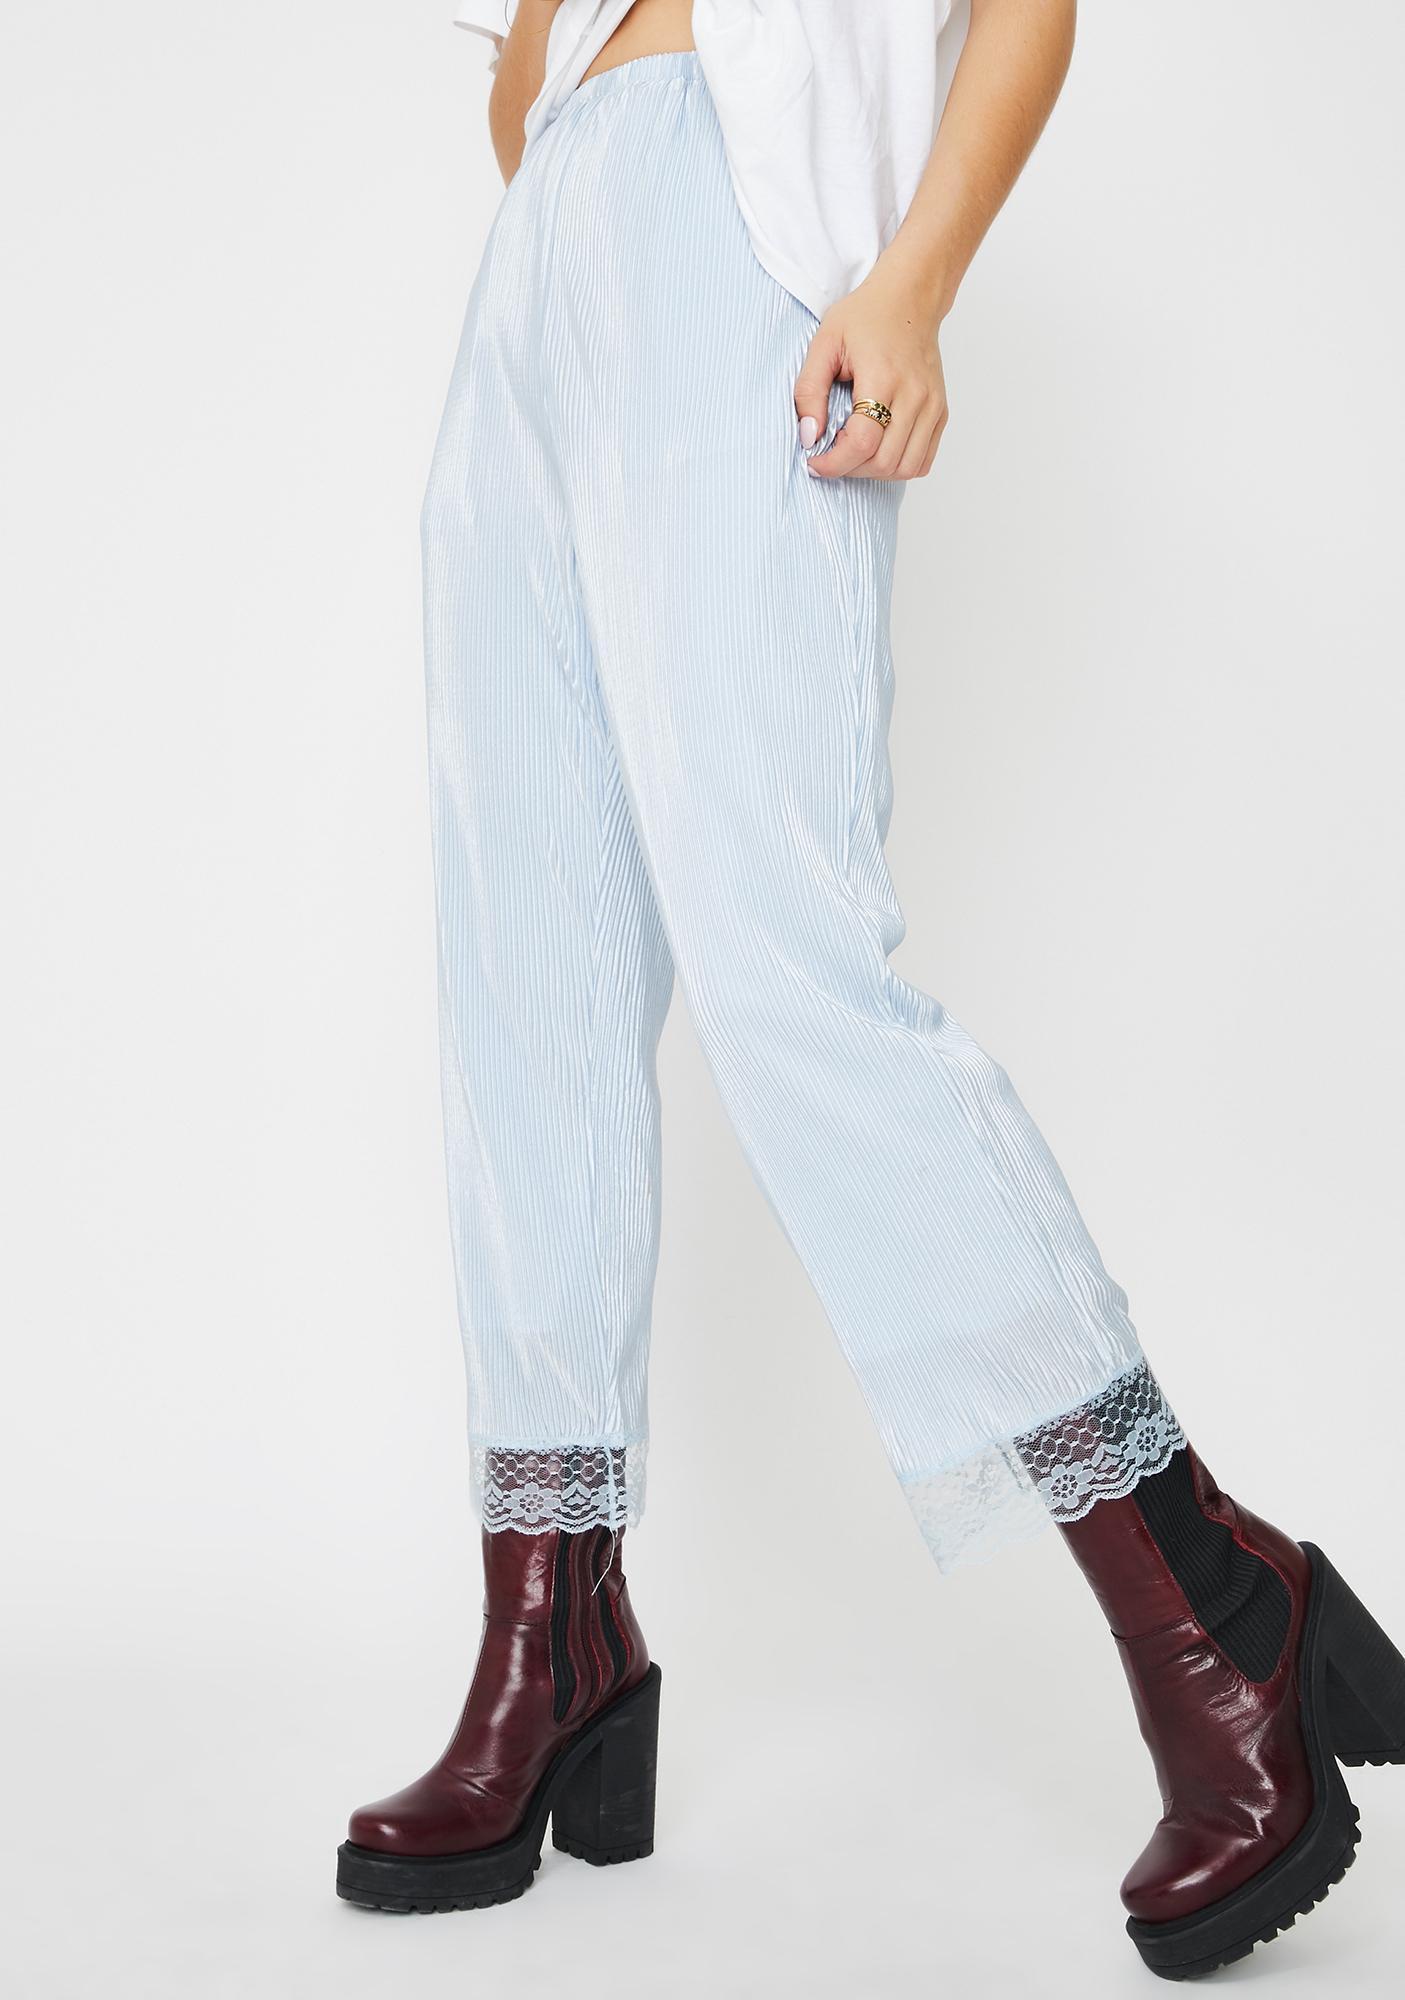 ZYA Periwinkle Micro Pleated Satin Pants